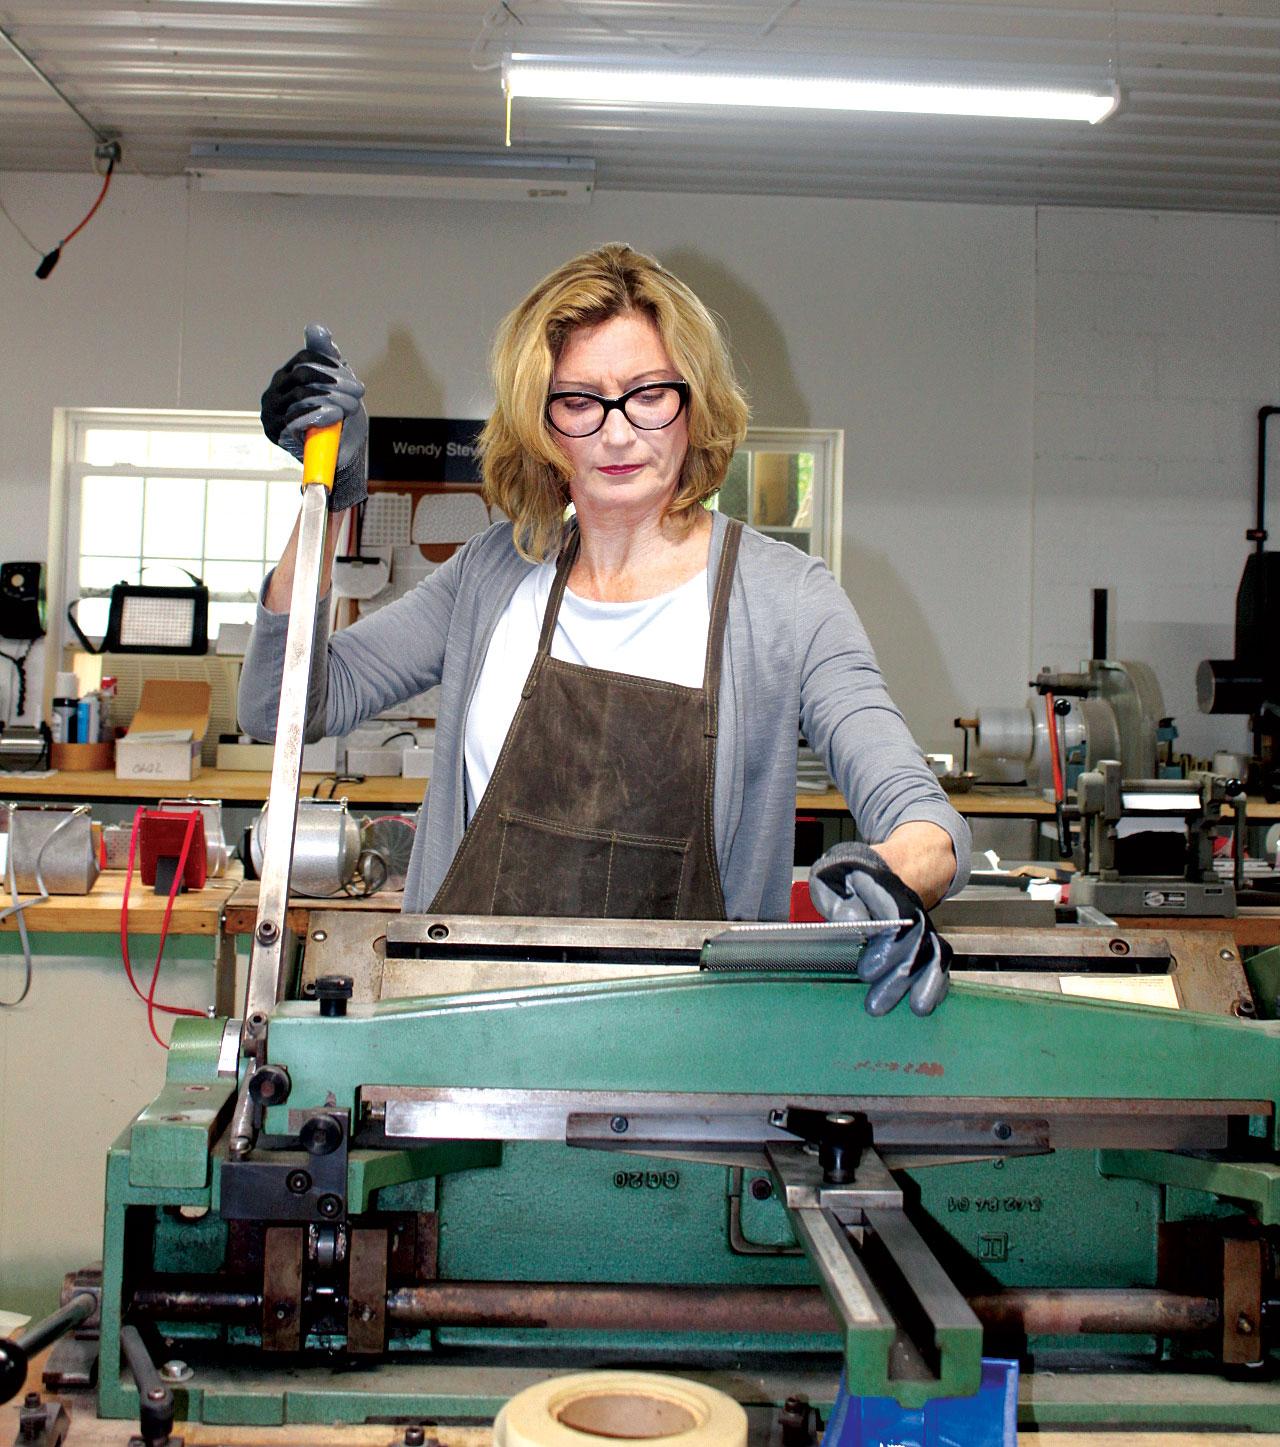 WENDY STEVENS at her hand shear cutting sheet metal.  Photograph by Dariel Benton-Updike.